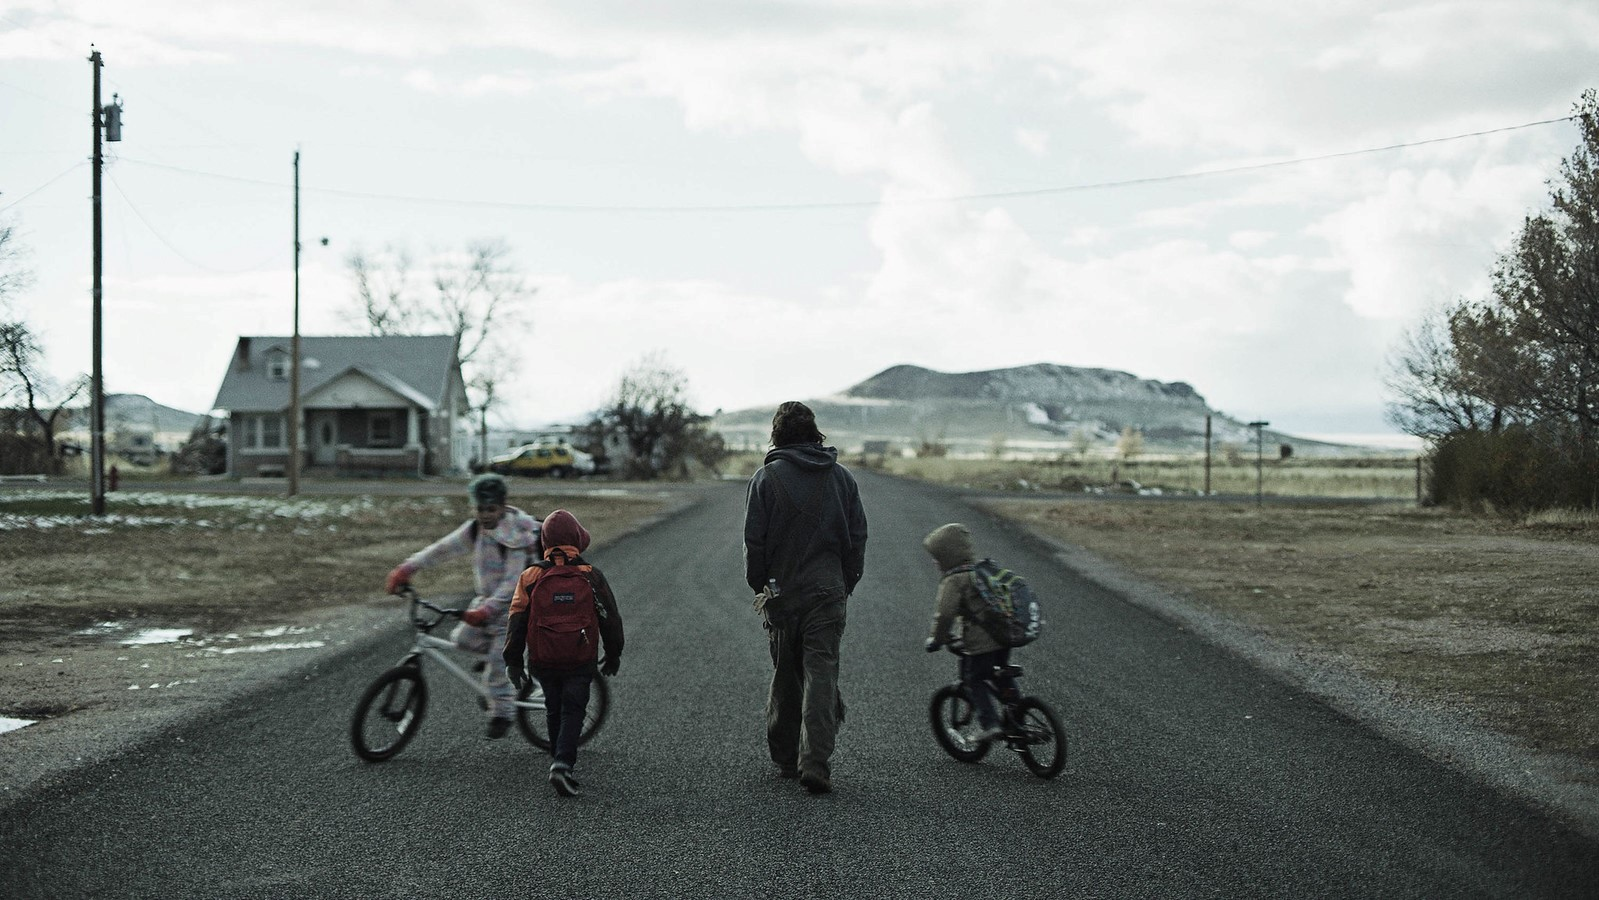 David walks with three of his children